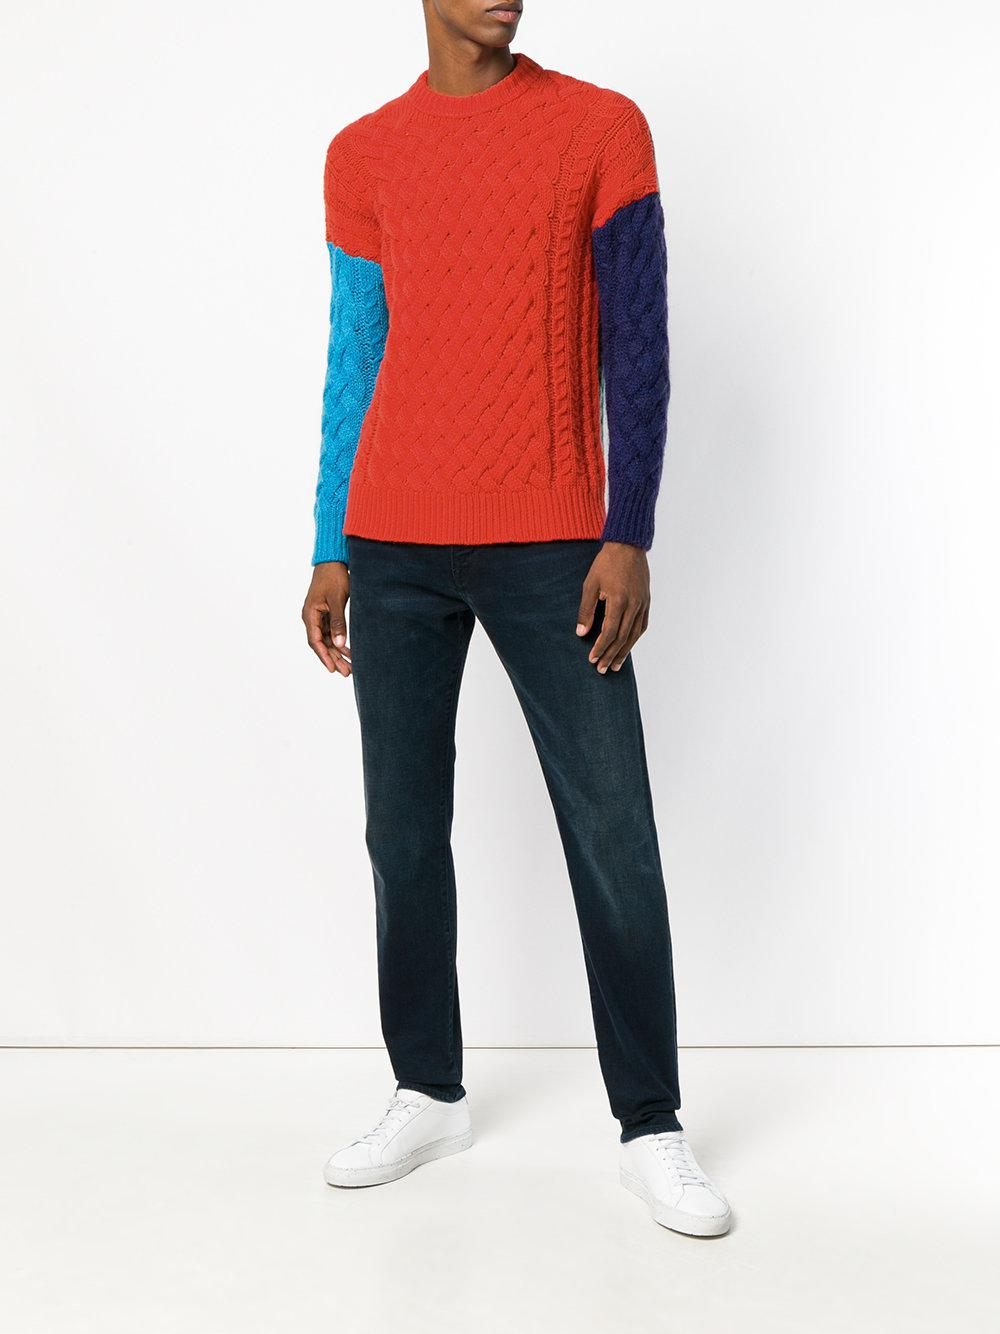 Roberto Collina Synthetic Colour Block Jumper for Men